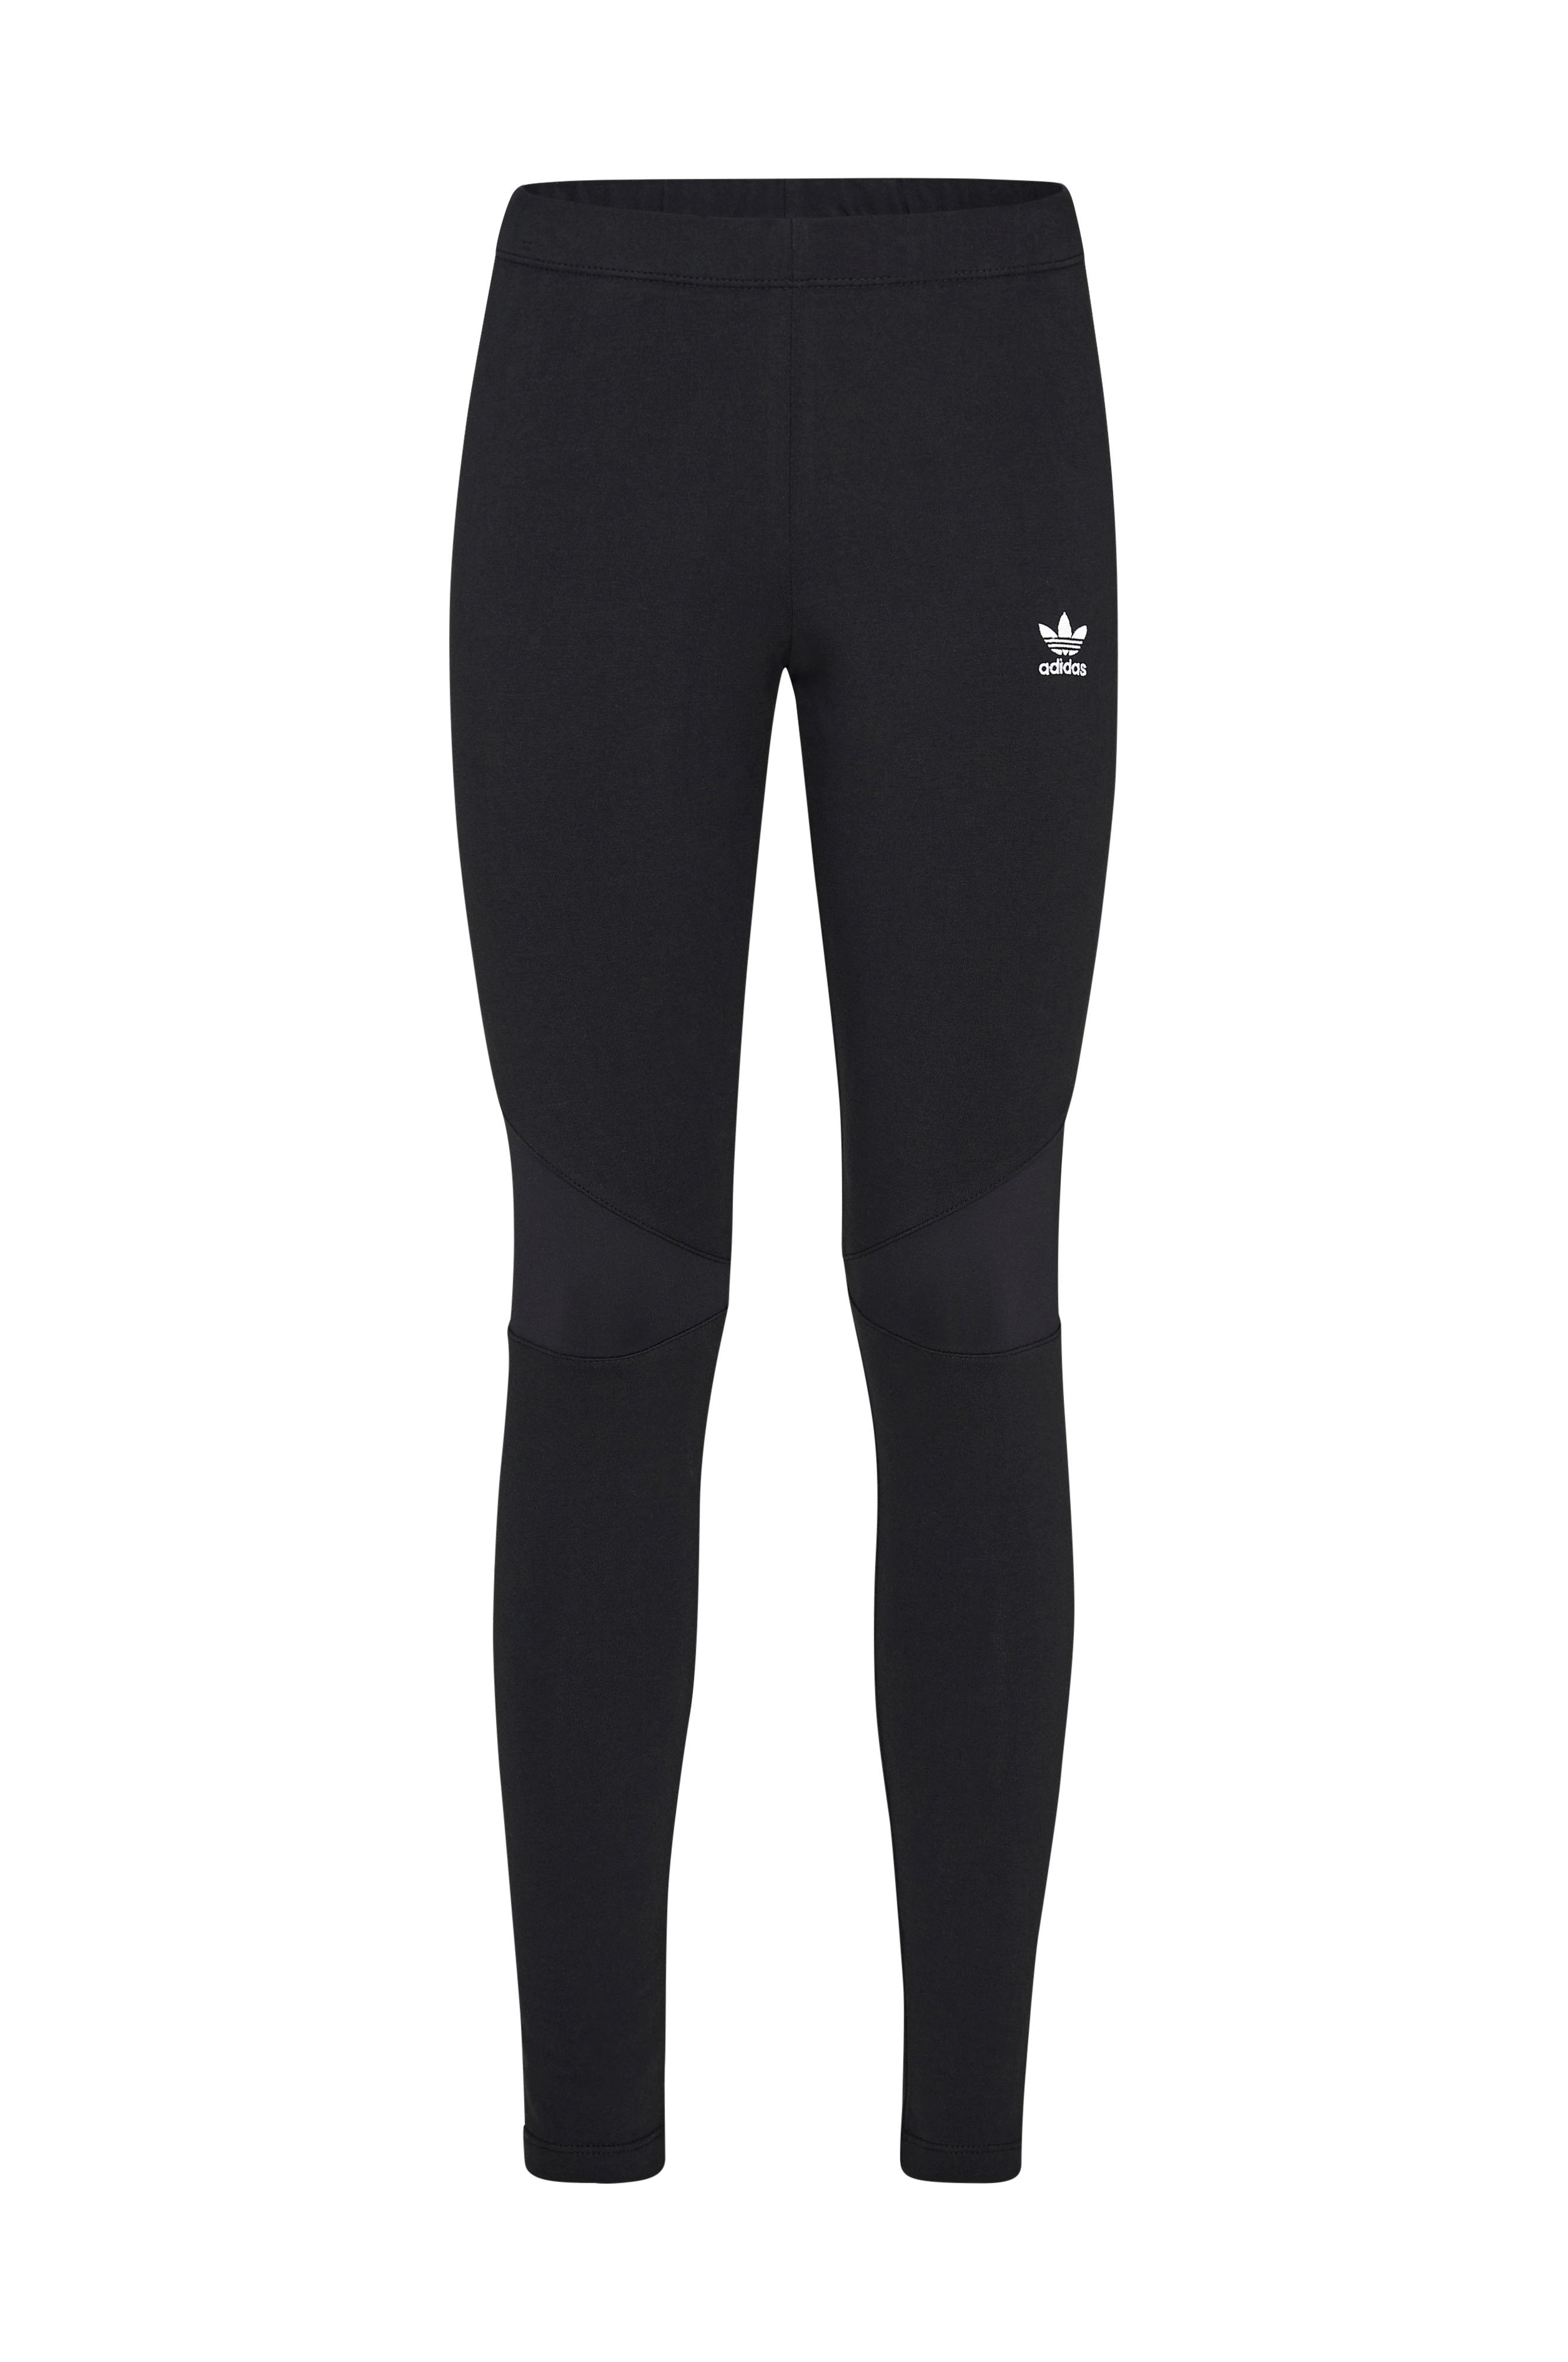 bcce2be4 adidas Originals Leggings CLRDO - Svart - Dame - Ellos.no